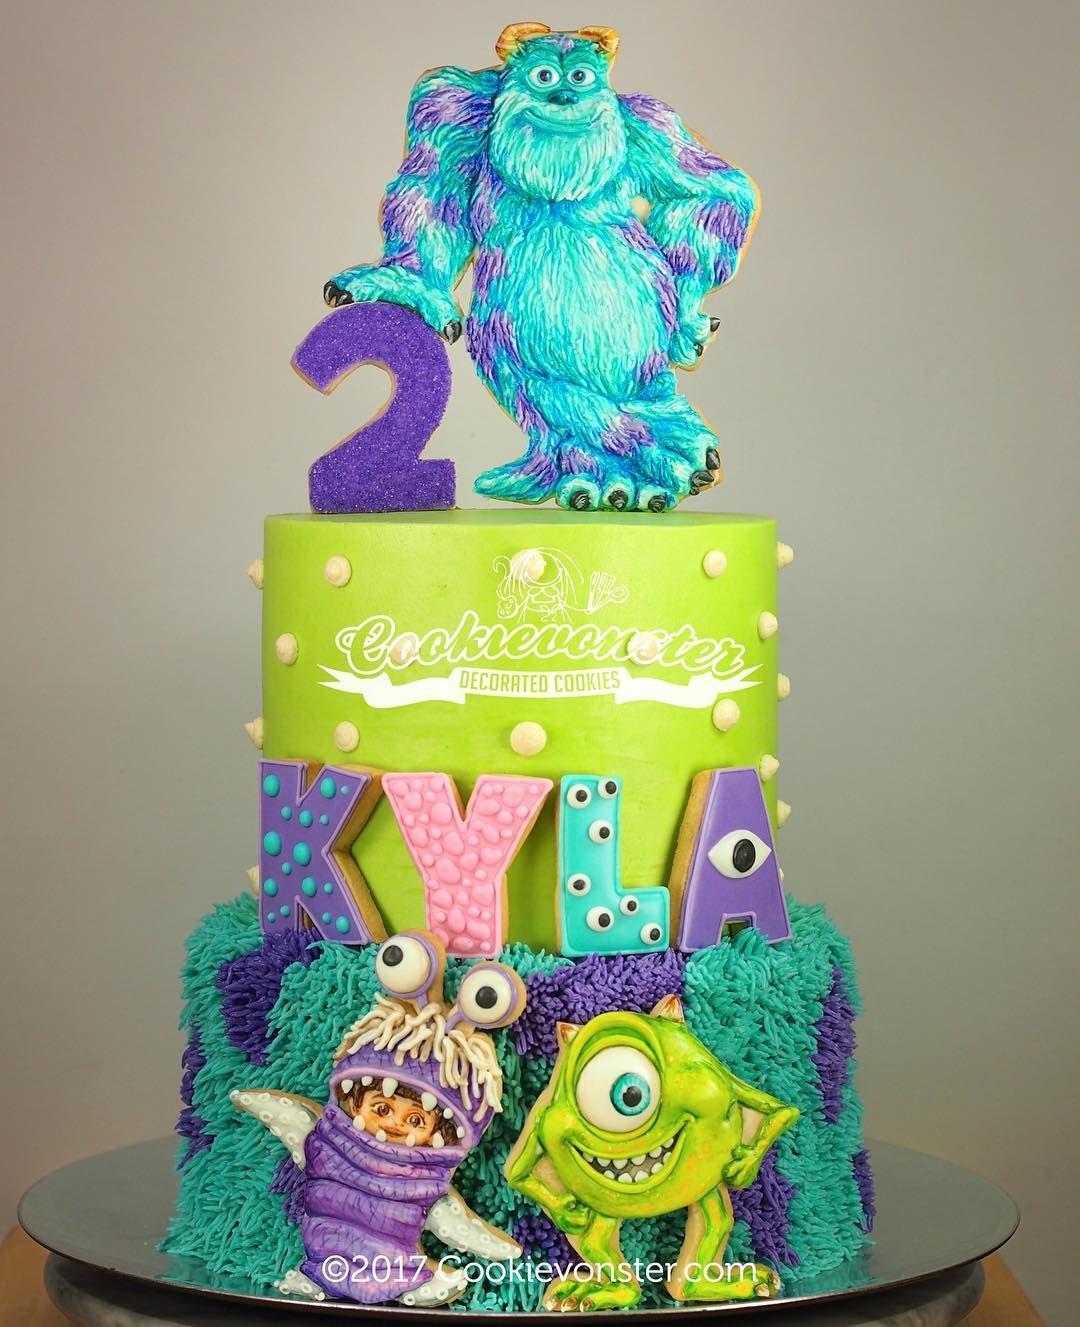 Pleasing Sulley Mike And Boo So Fun Monsterinc Funny Birthday Cards Online Hendilapandamsfinfo